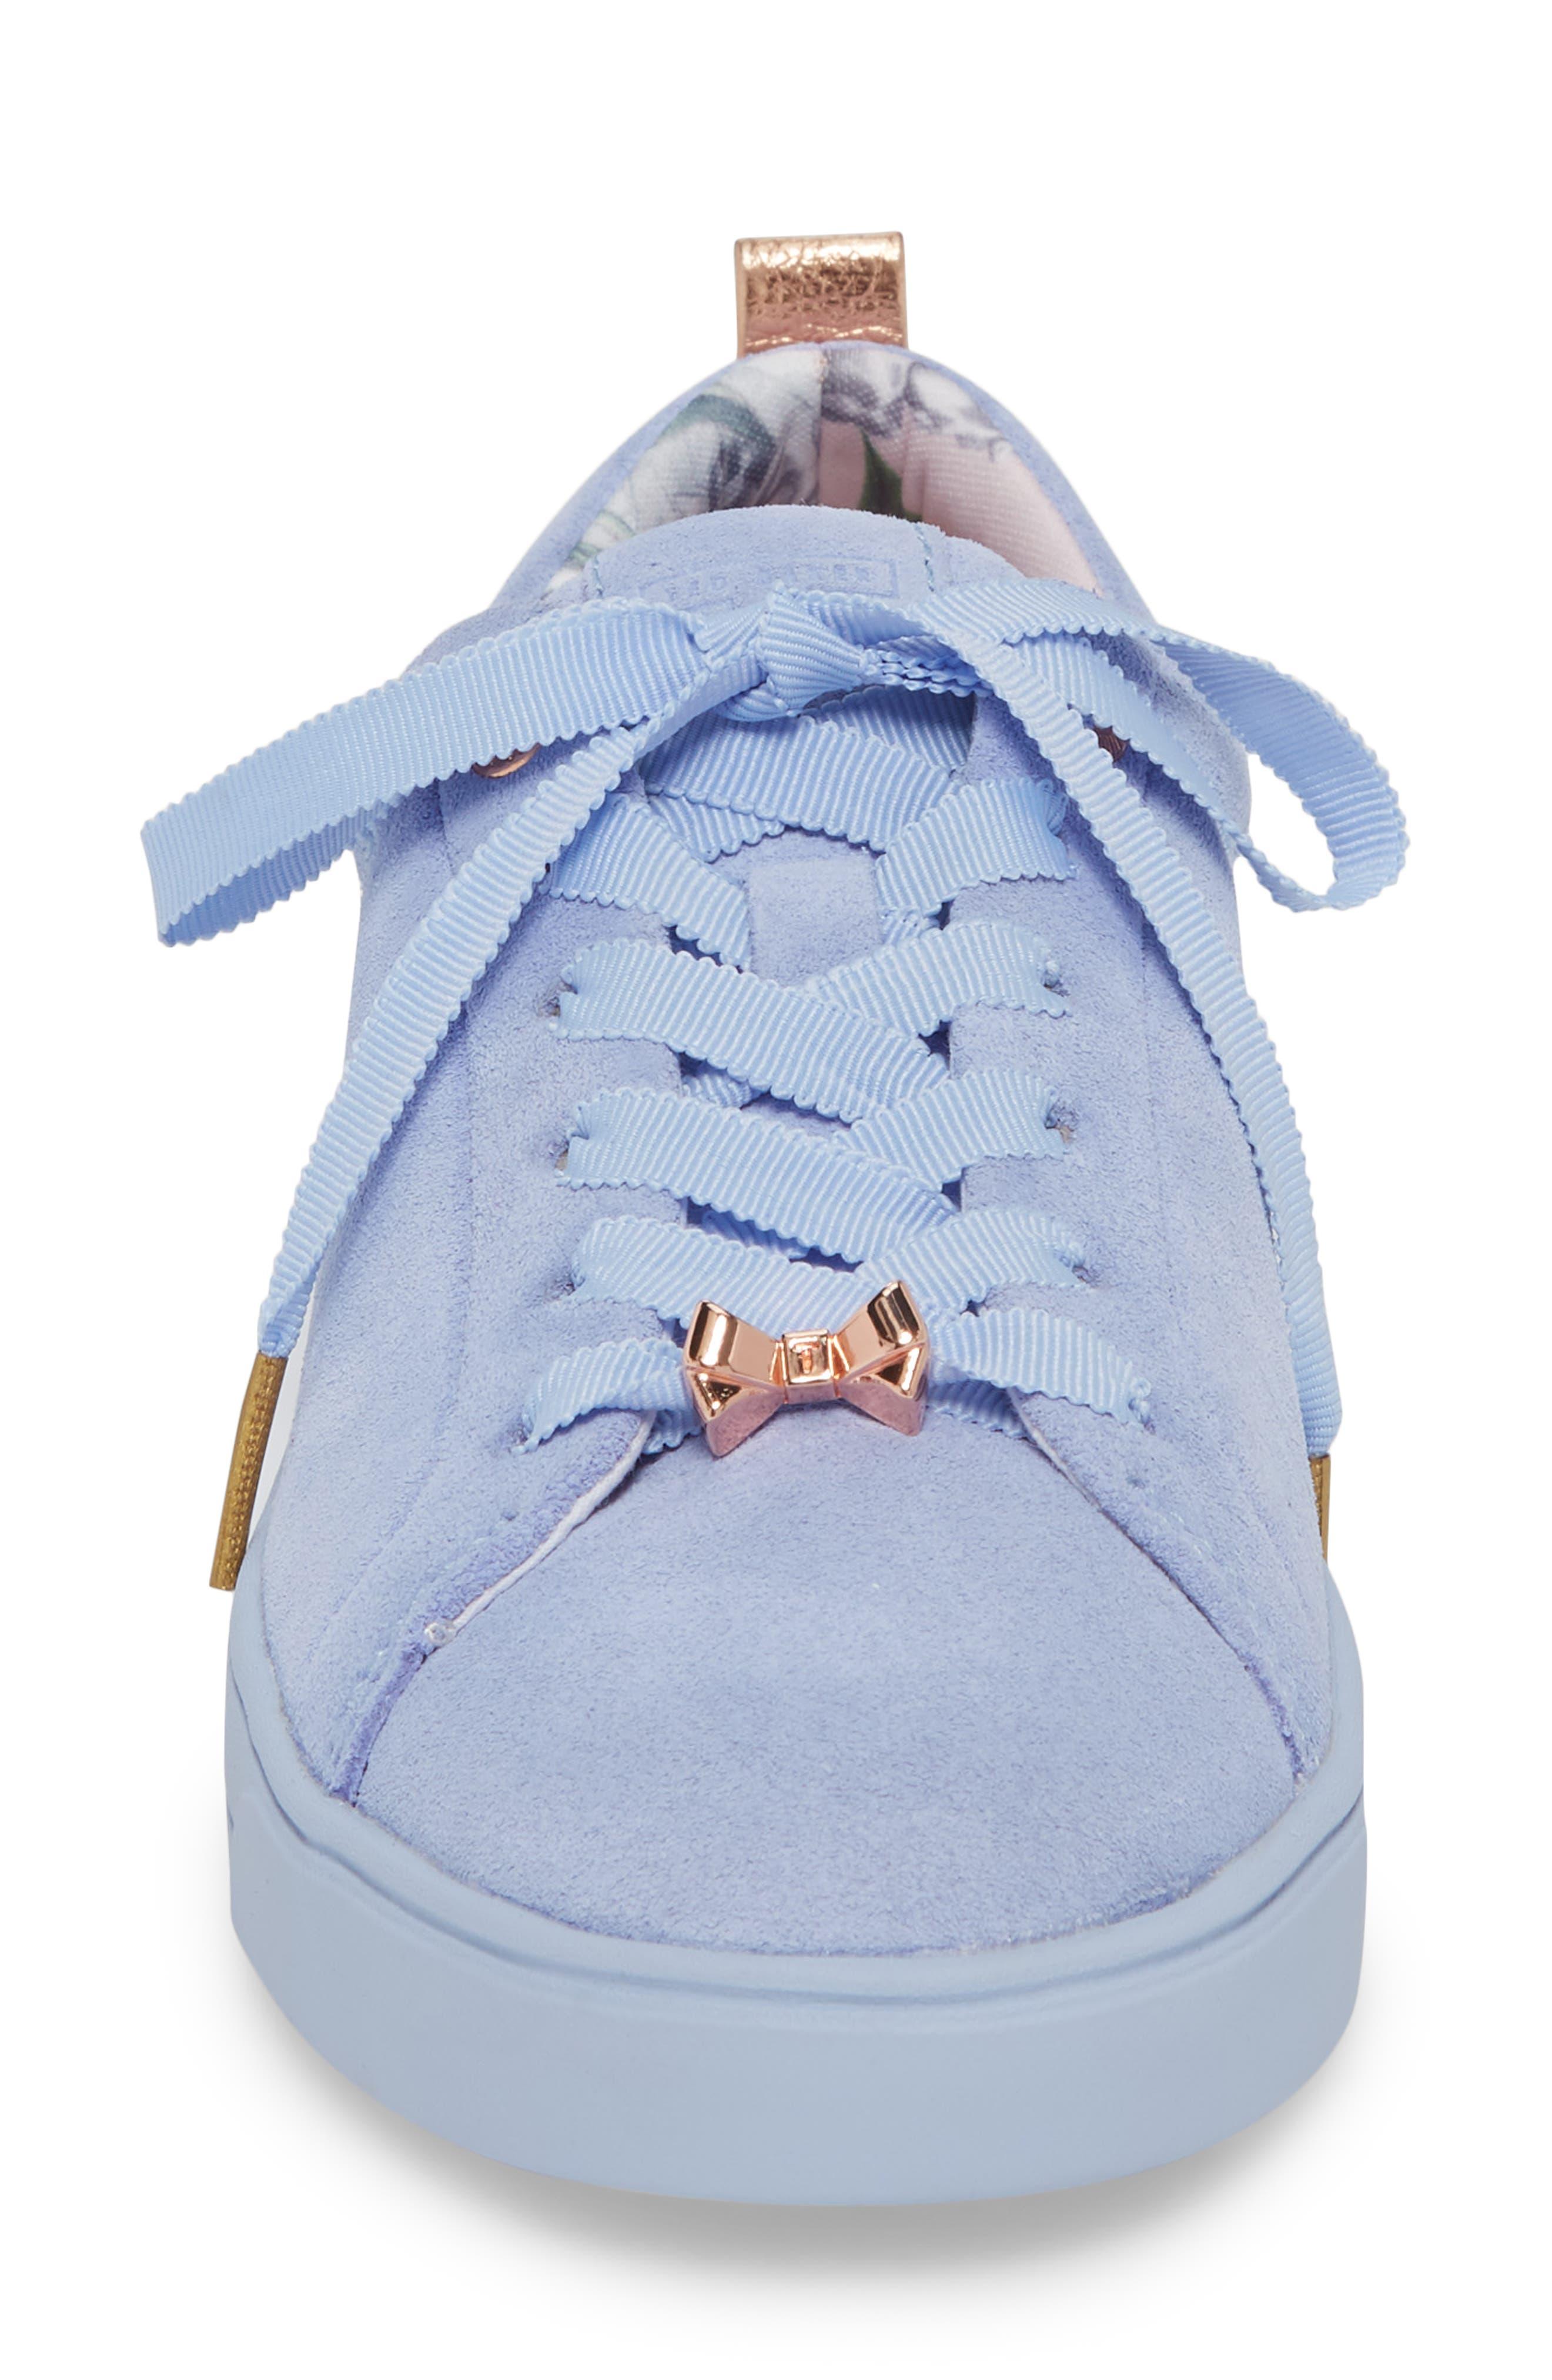 Kelleis Sneaker,                             Alternate thumbnail 4, color,                             Light Blue Suede